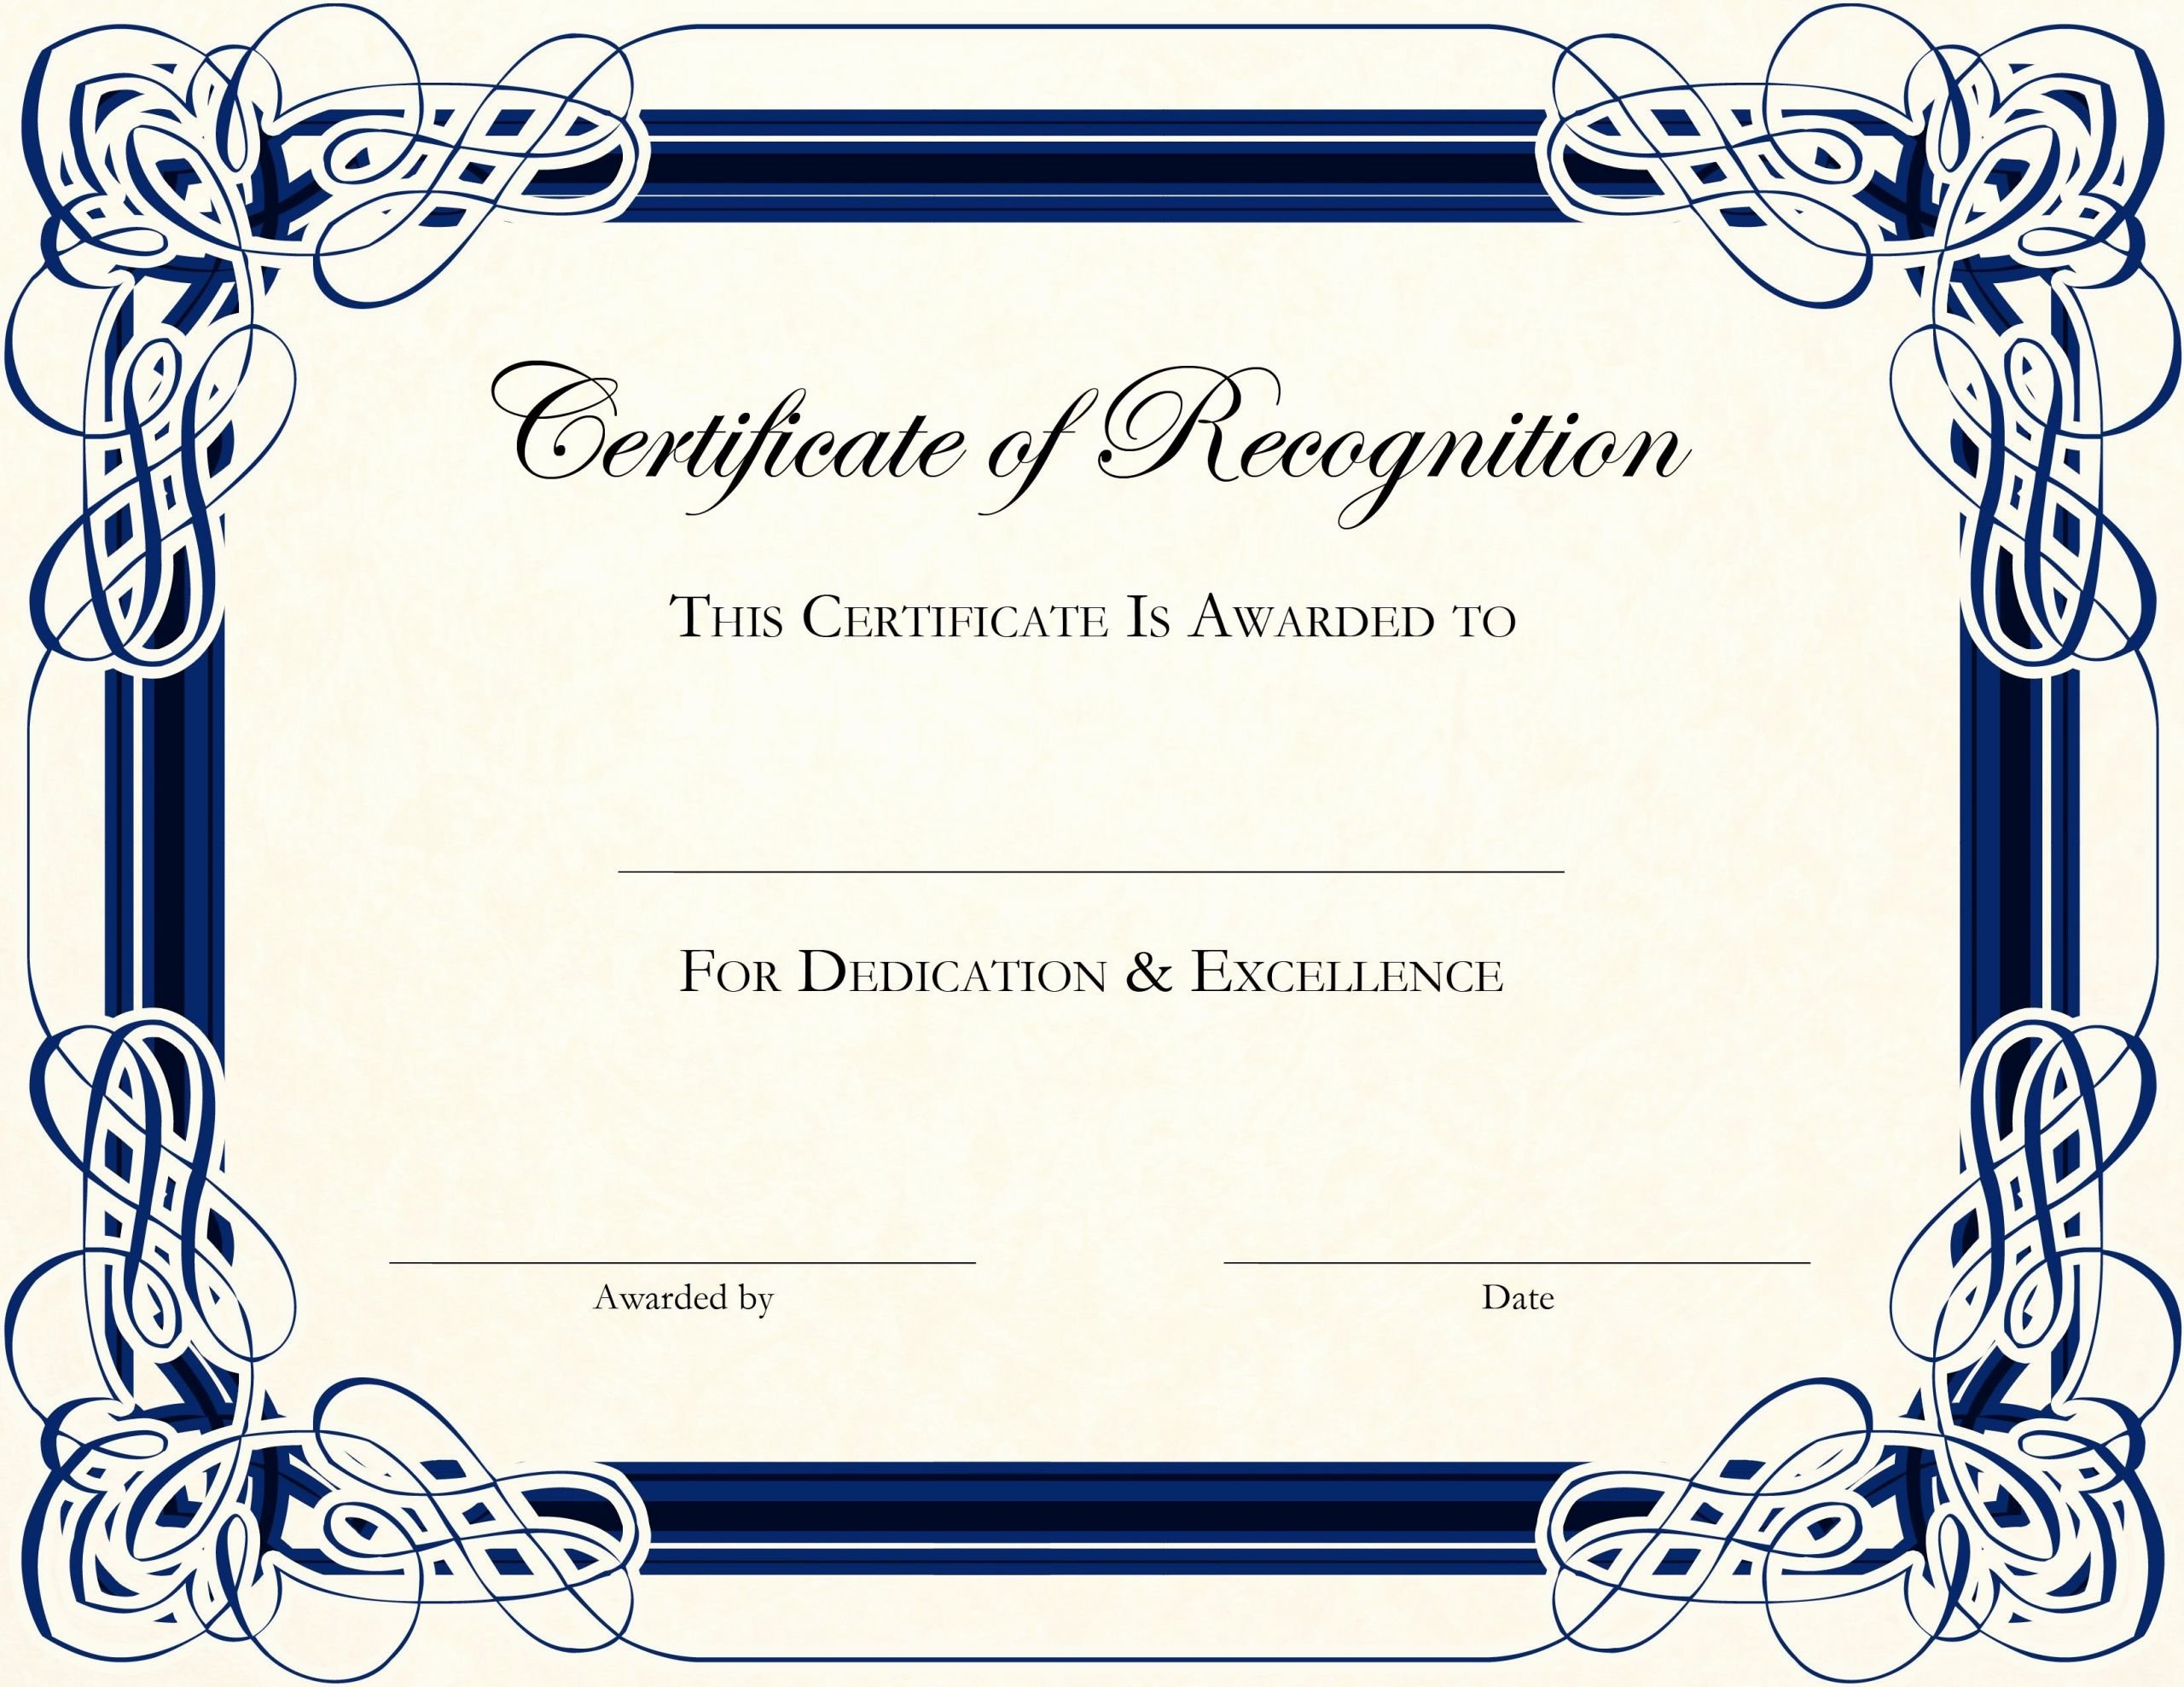 Teacher Appreciation Certificate Template Free Fresh Free Printable Certificate Templates for Teachers